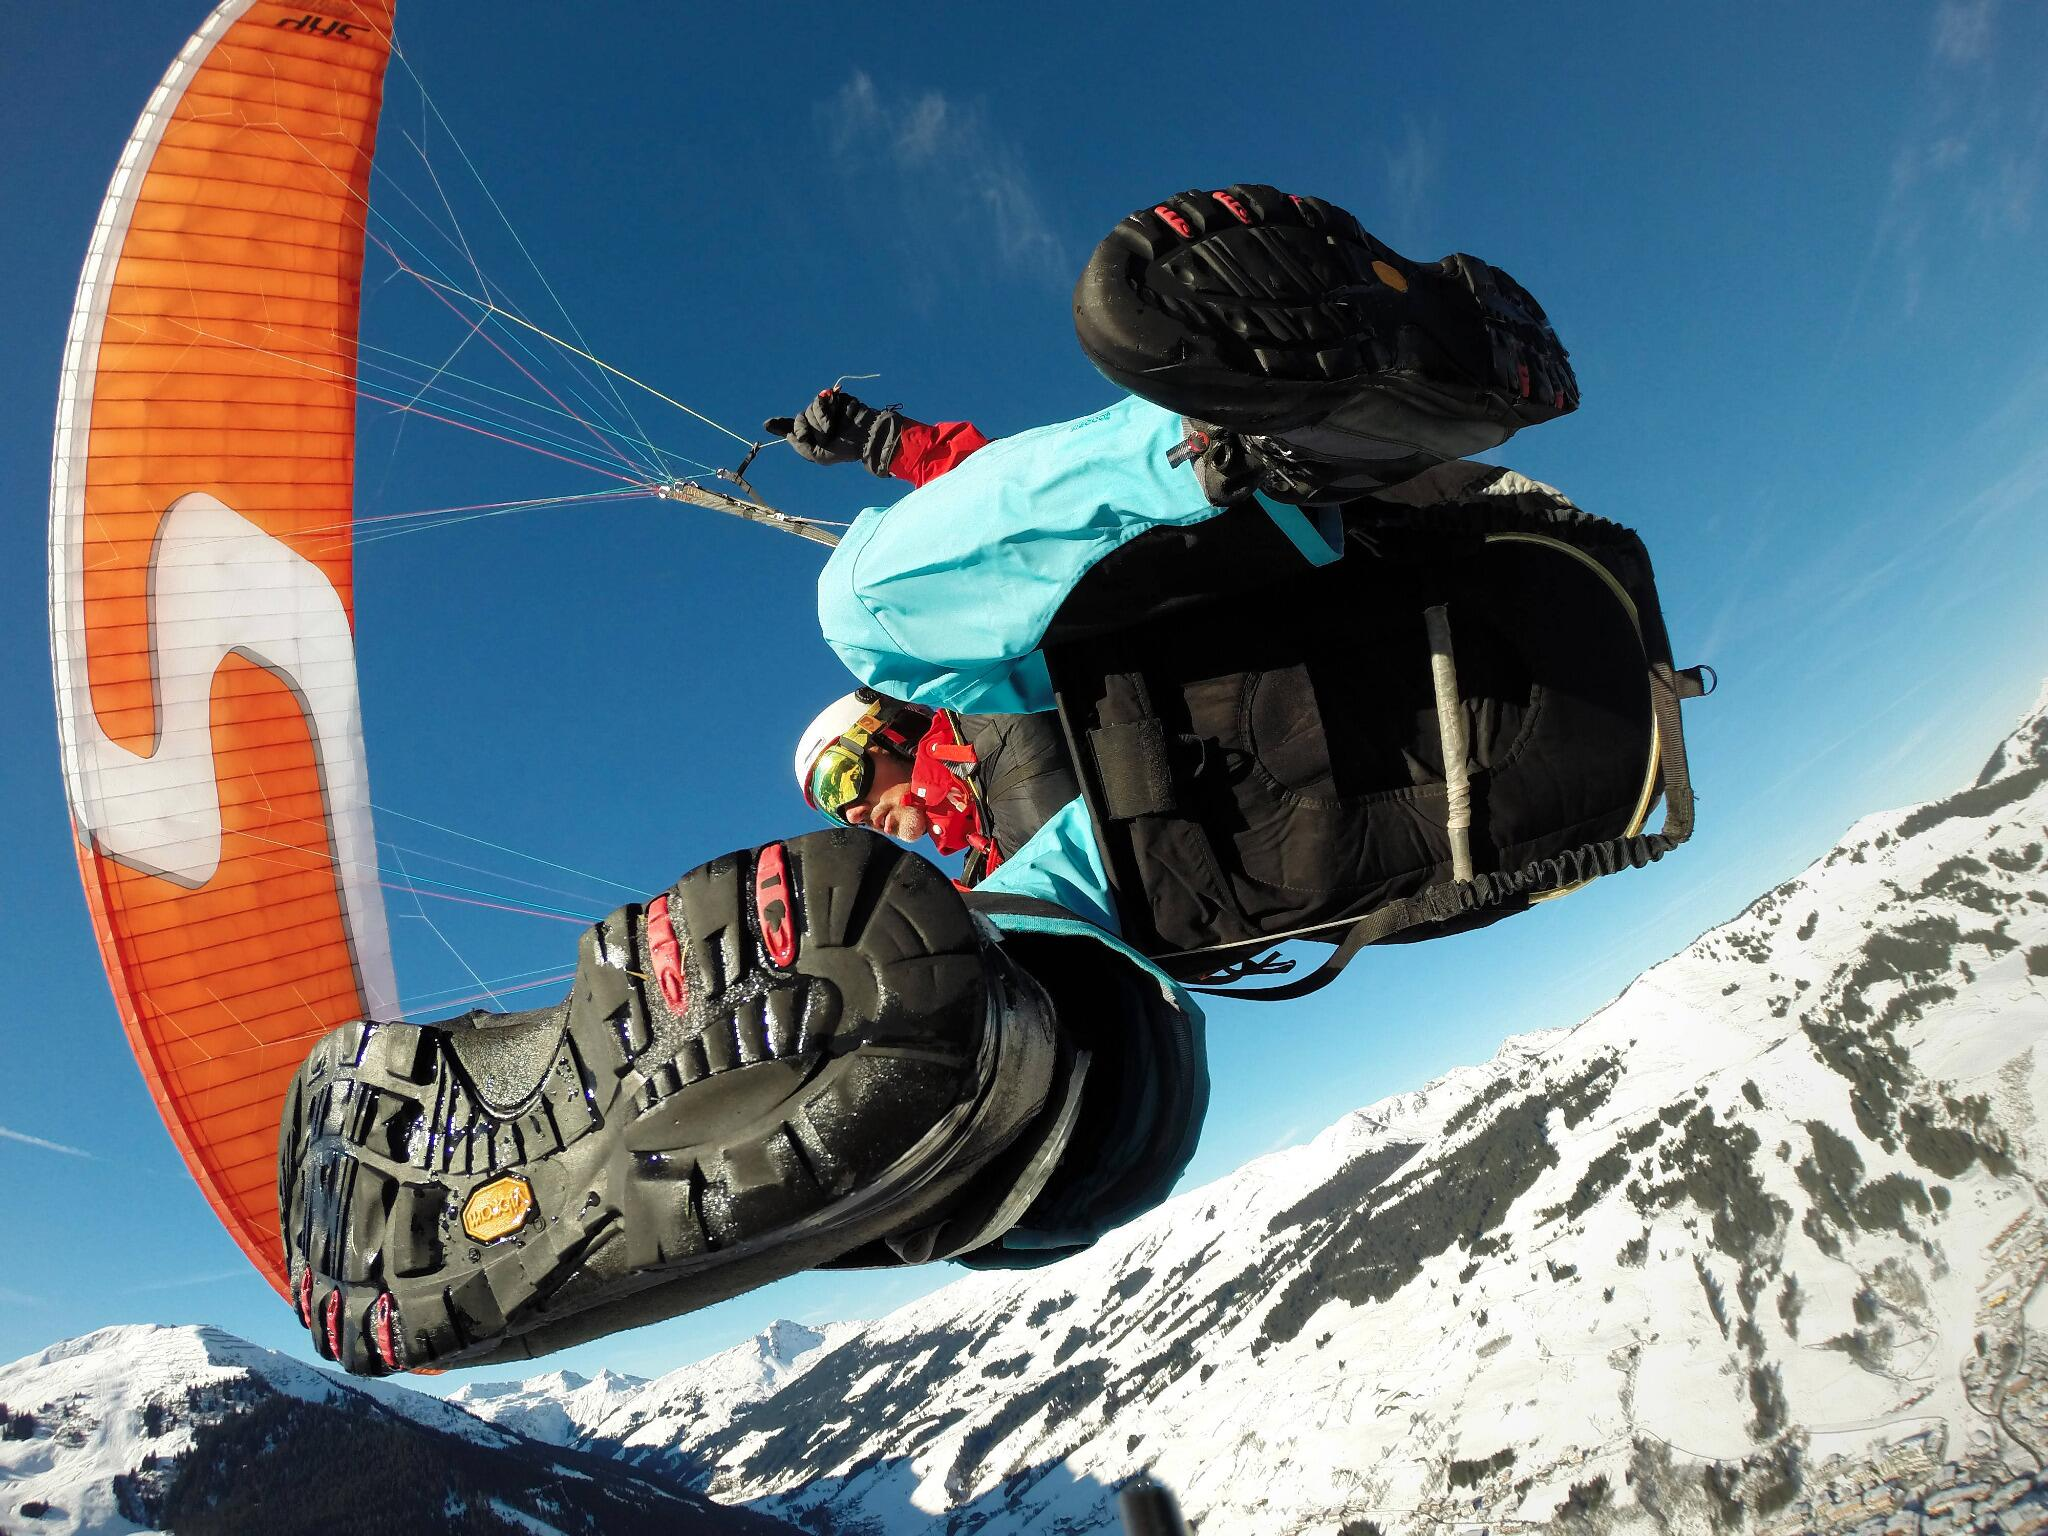 Paragliding in Saalbach-Hinterglemm, Austria with @duelago. http://t.co/nN2uZs29WP